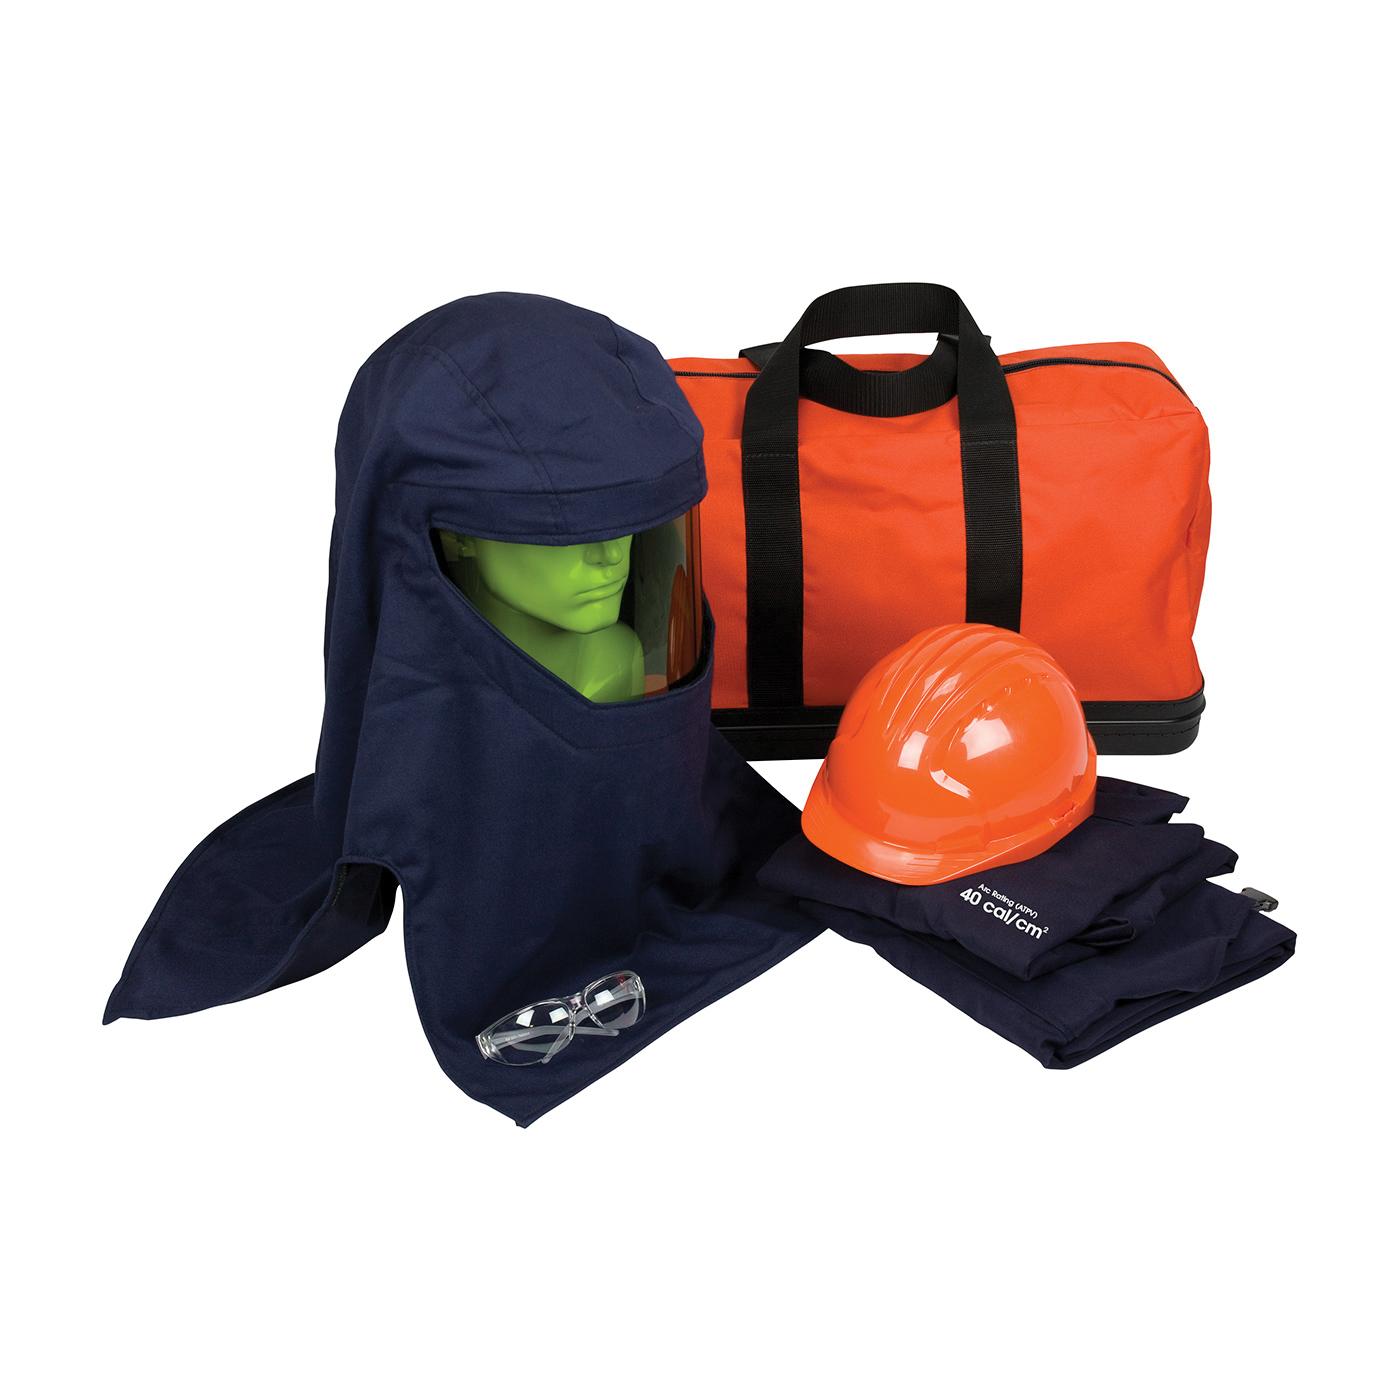 PIP® 9150-52436/2X Arc Flash Kit, Hazard Risk Category (HRC): 4, Hood/Face Shield Max Arc Flash Protection: 40 cal/sq-cm, Garment Max Arc Flash Protection: 40 cal/sq-cm, Specifications Met: NFPA 70E-2018, Arc Hood/Hard Hat Head/Face Protection, 2XL Garment